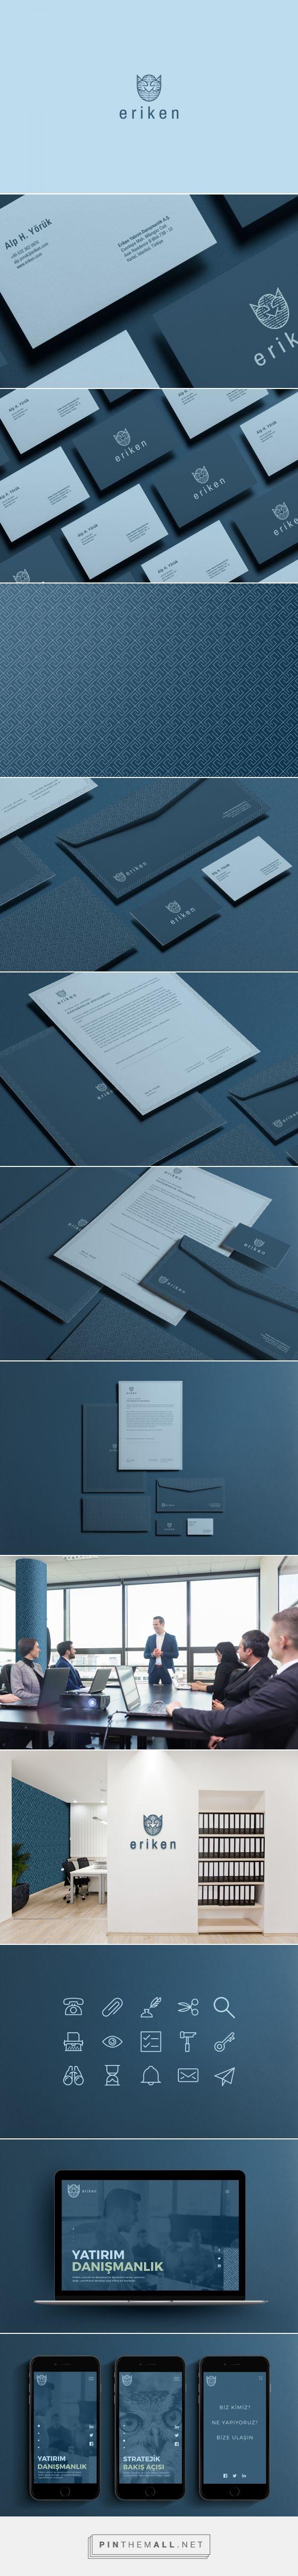 Eriken Investment Advisors Branding by Studio Recode | Logo Designer Bradenton, Web Design Sarasota, Tampa Fivestar Branding Agency